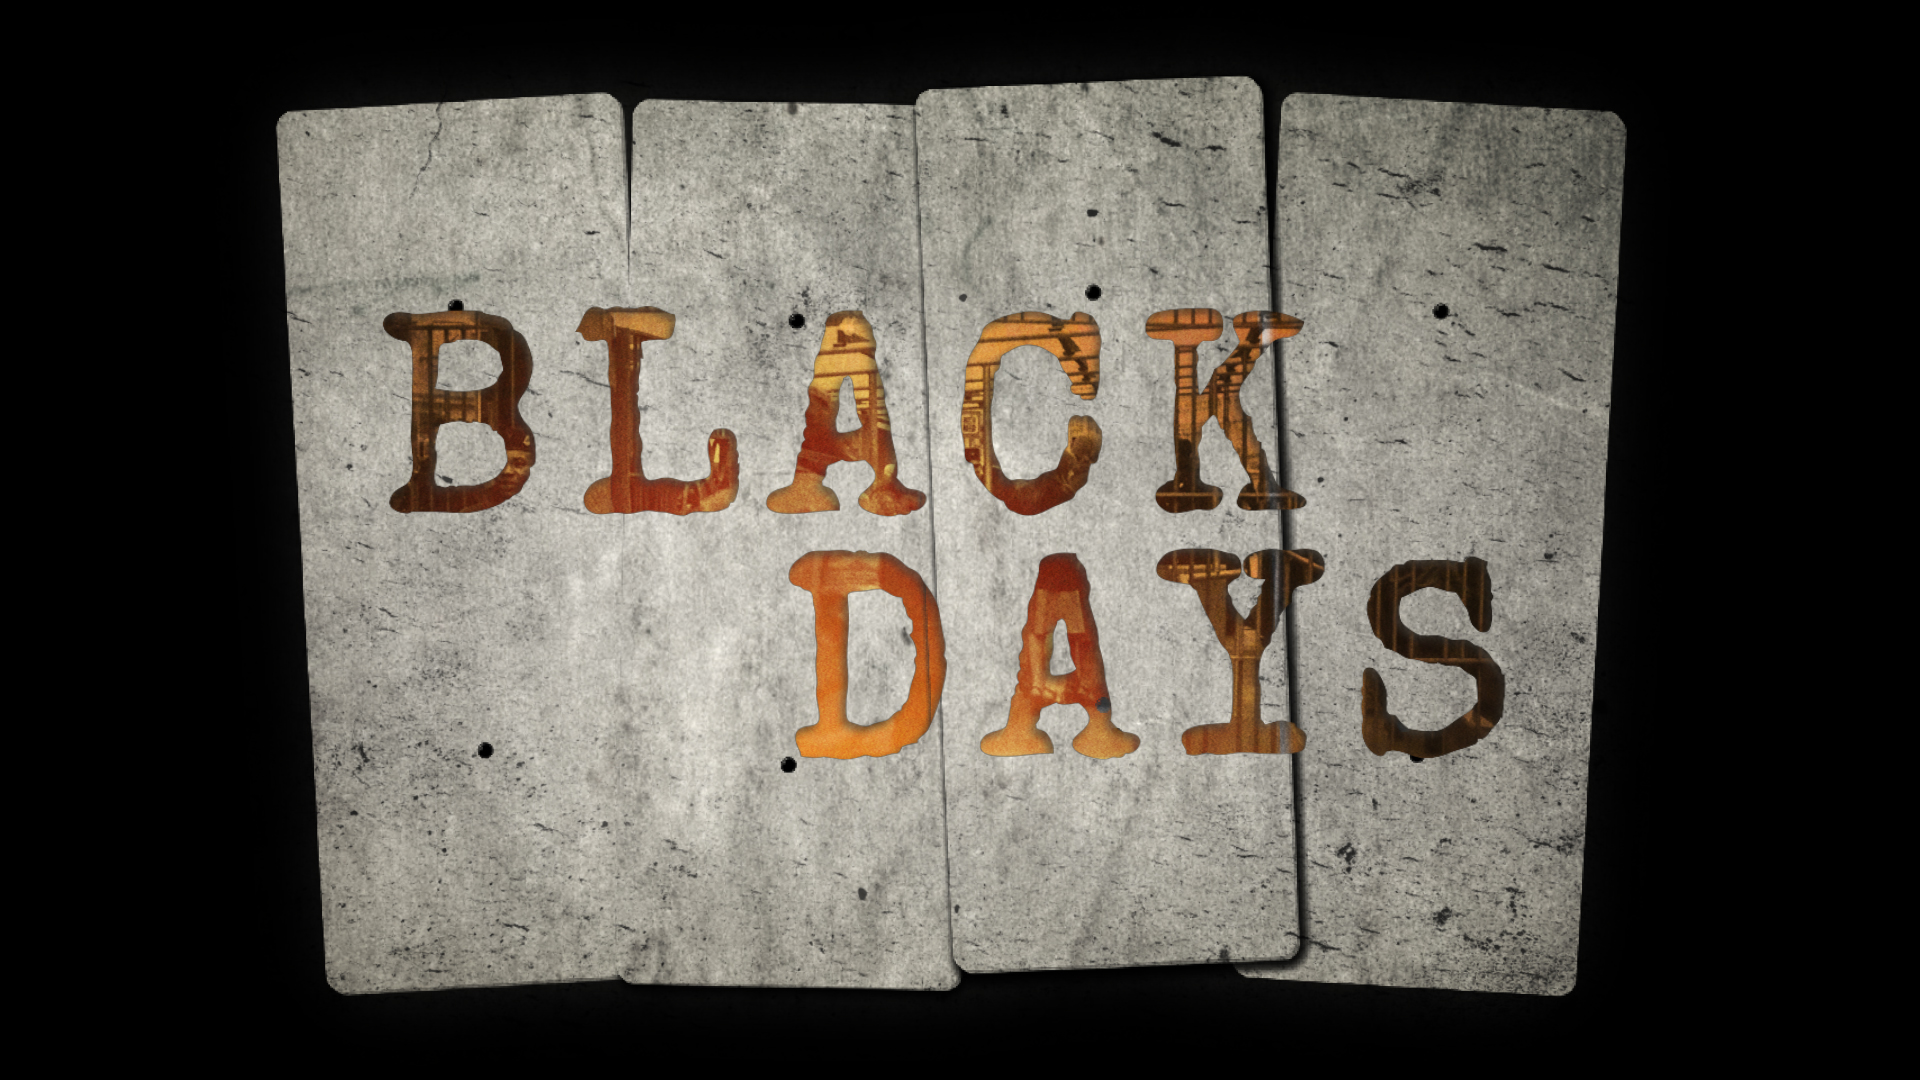 8. BLACK DAYS (0-00-04-21)